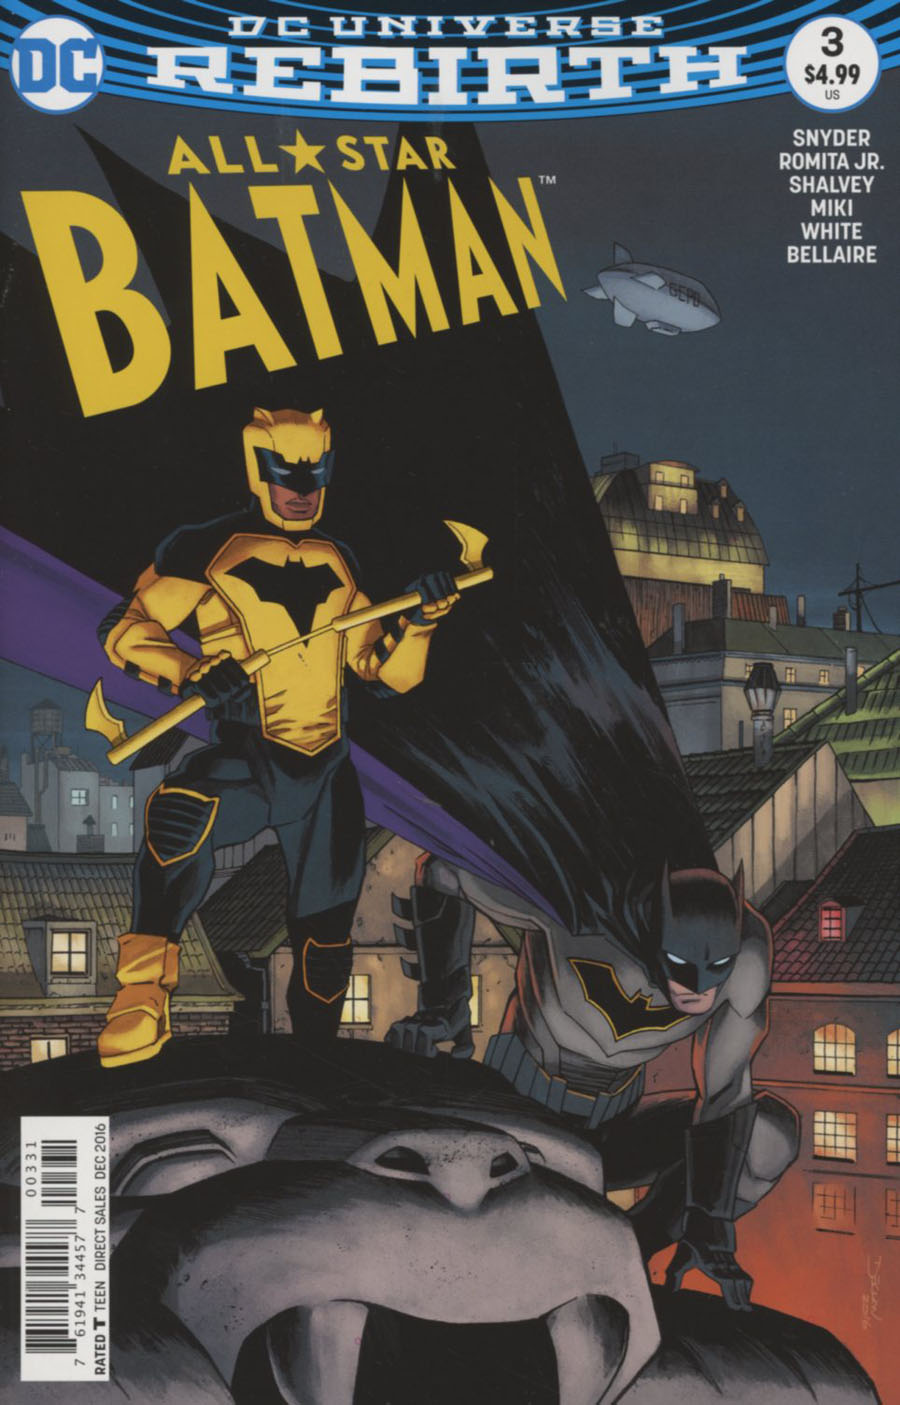 All-Star Batman #3 Cover C Variant Declan Shalvey Cover